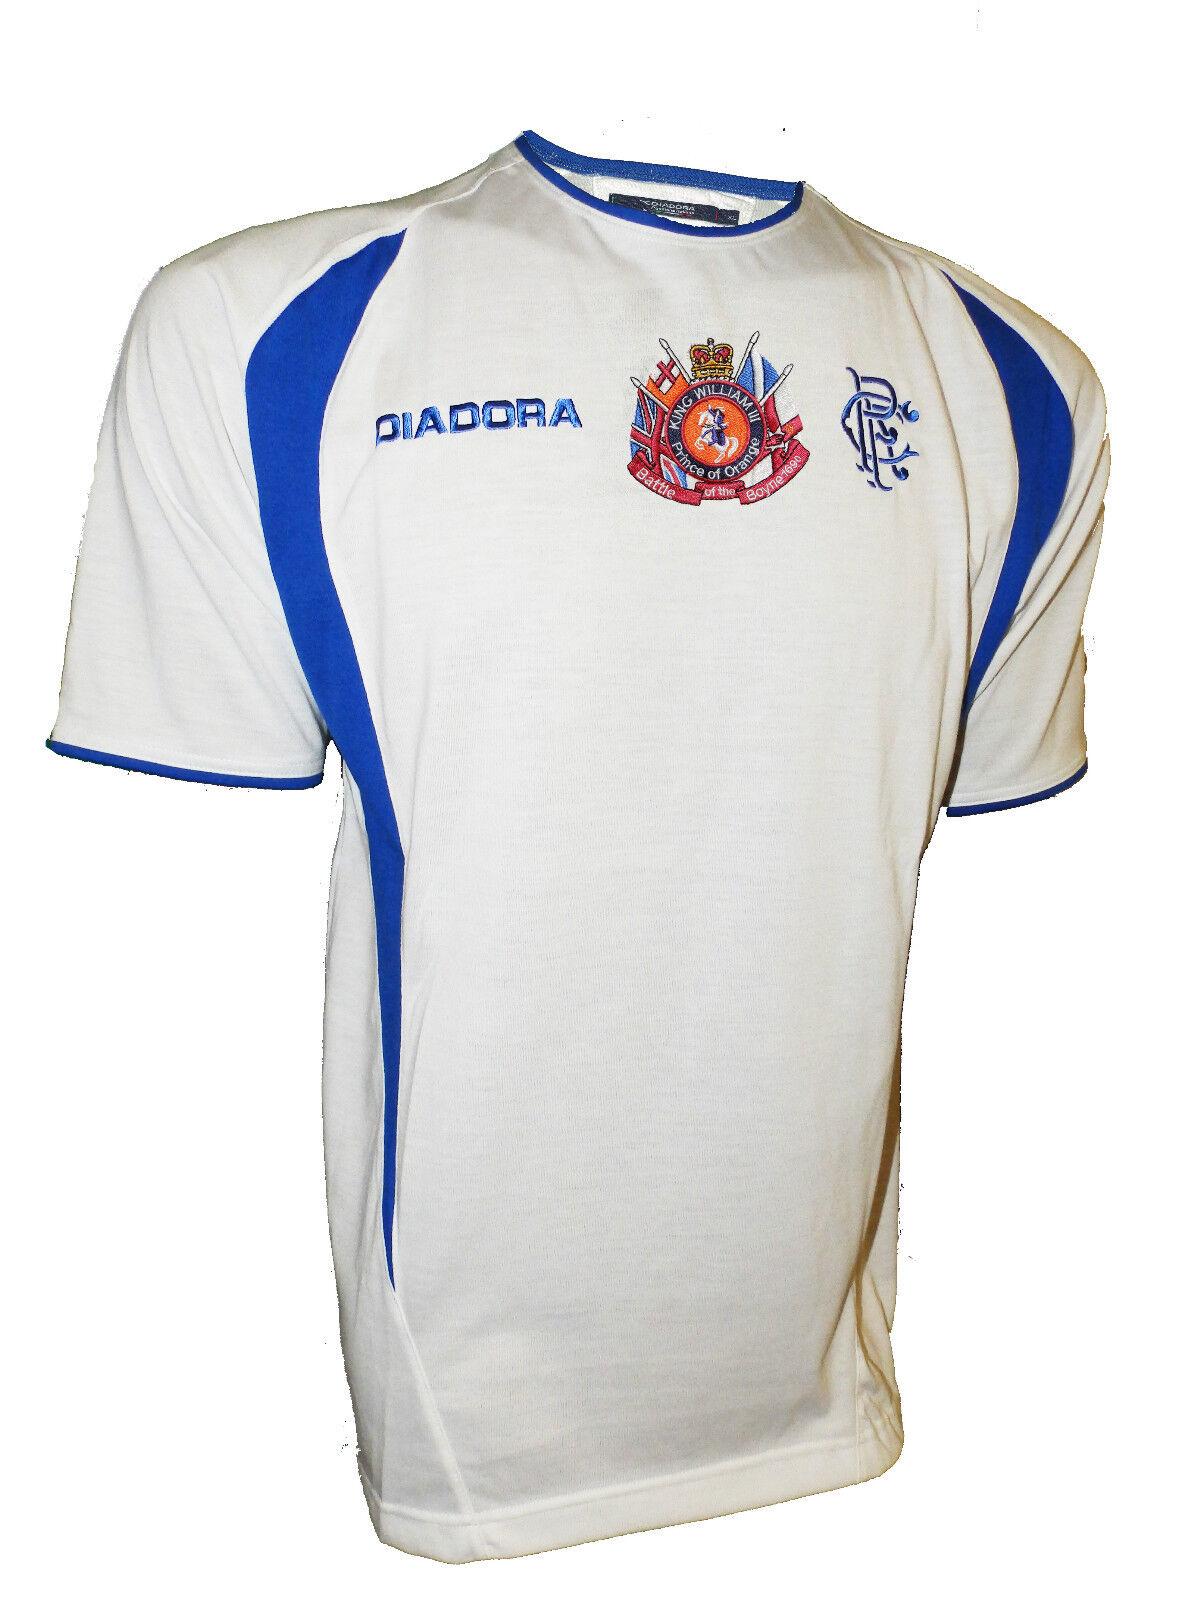 Glasgow rangers fc football shirt king billy william of